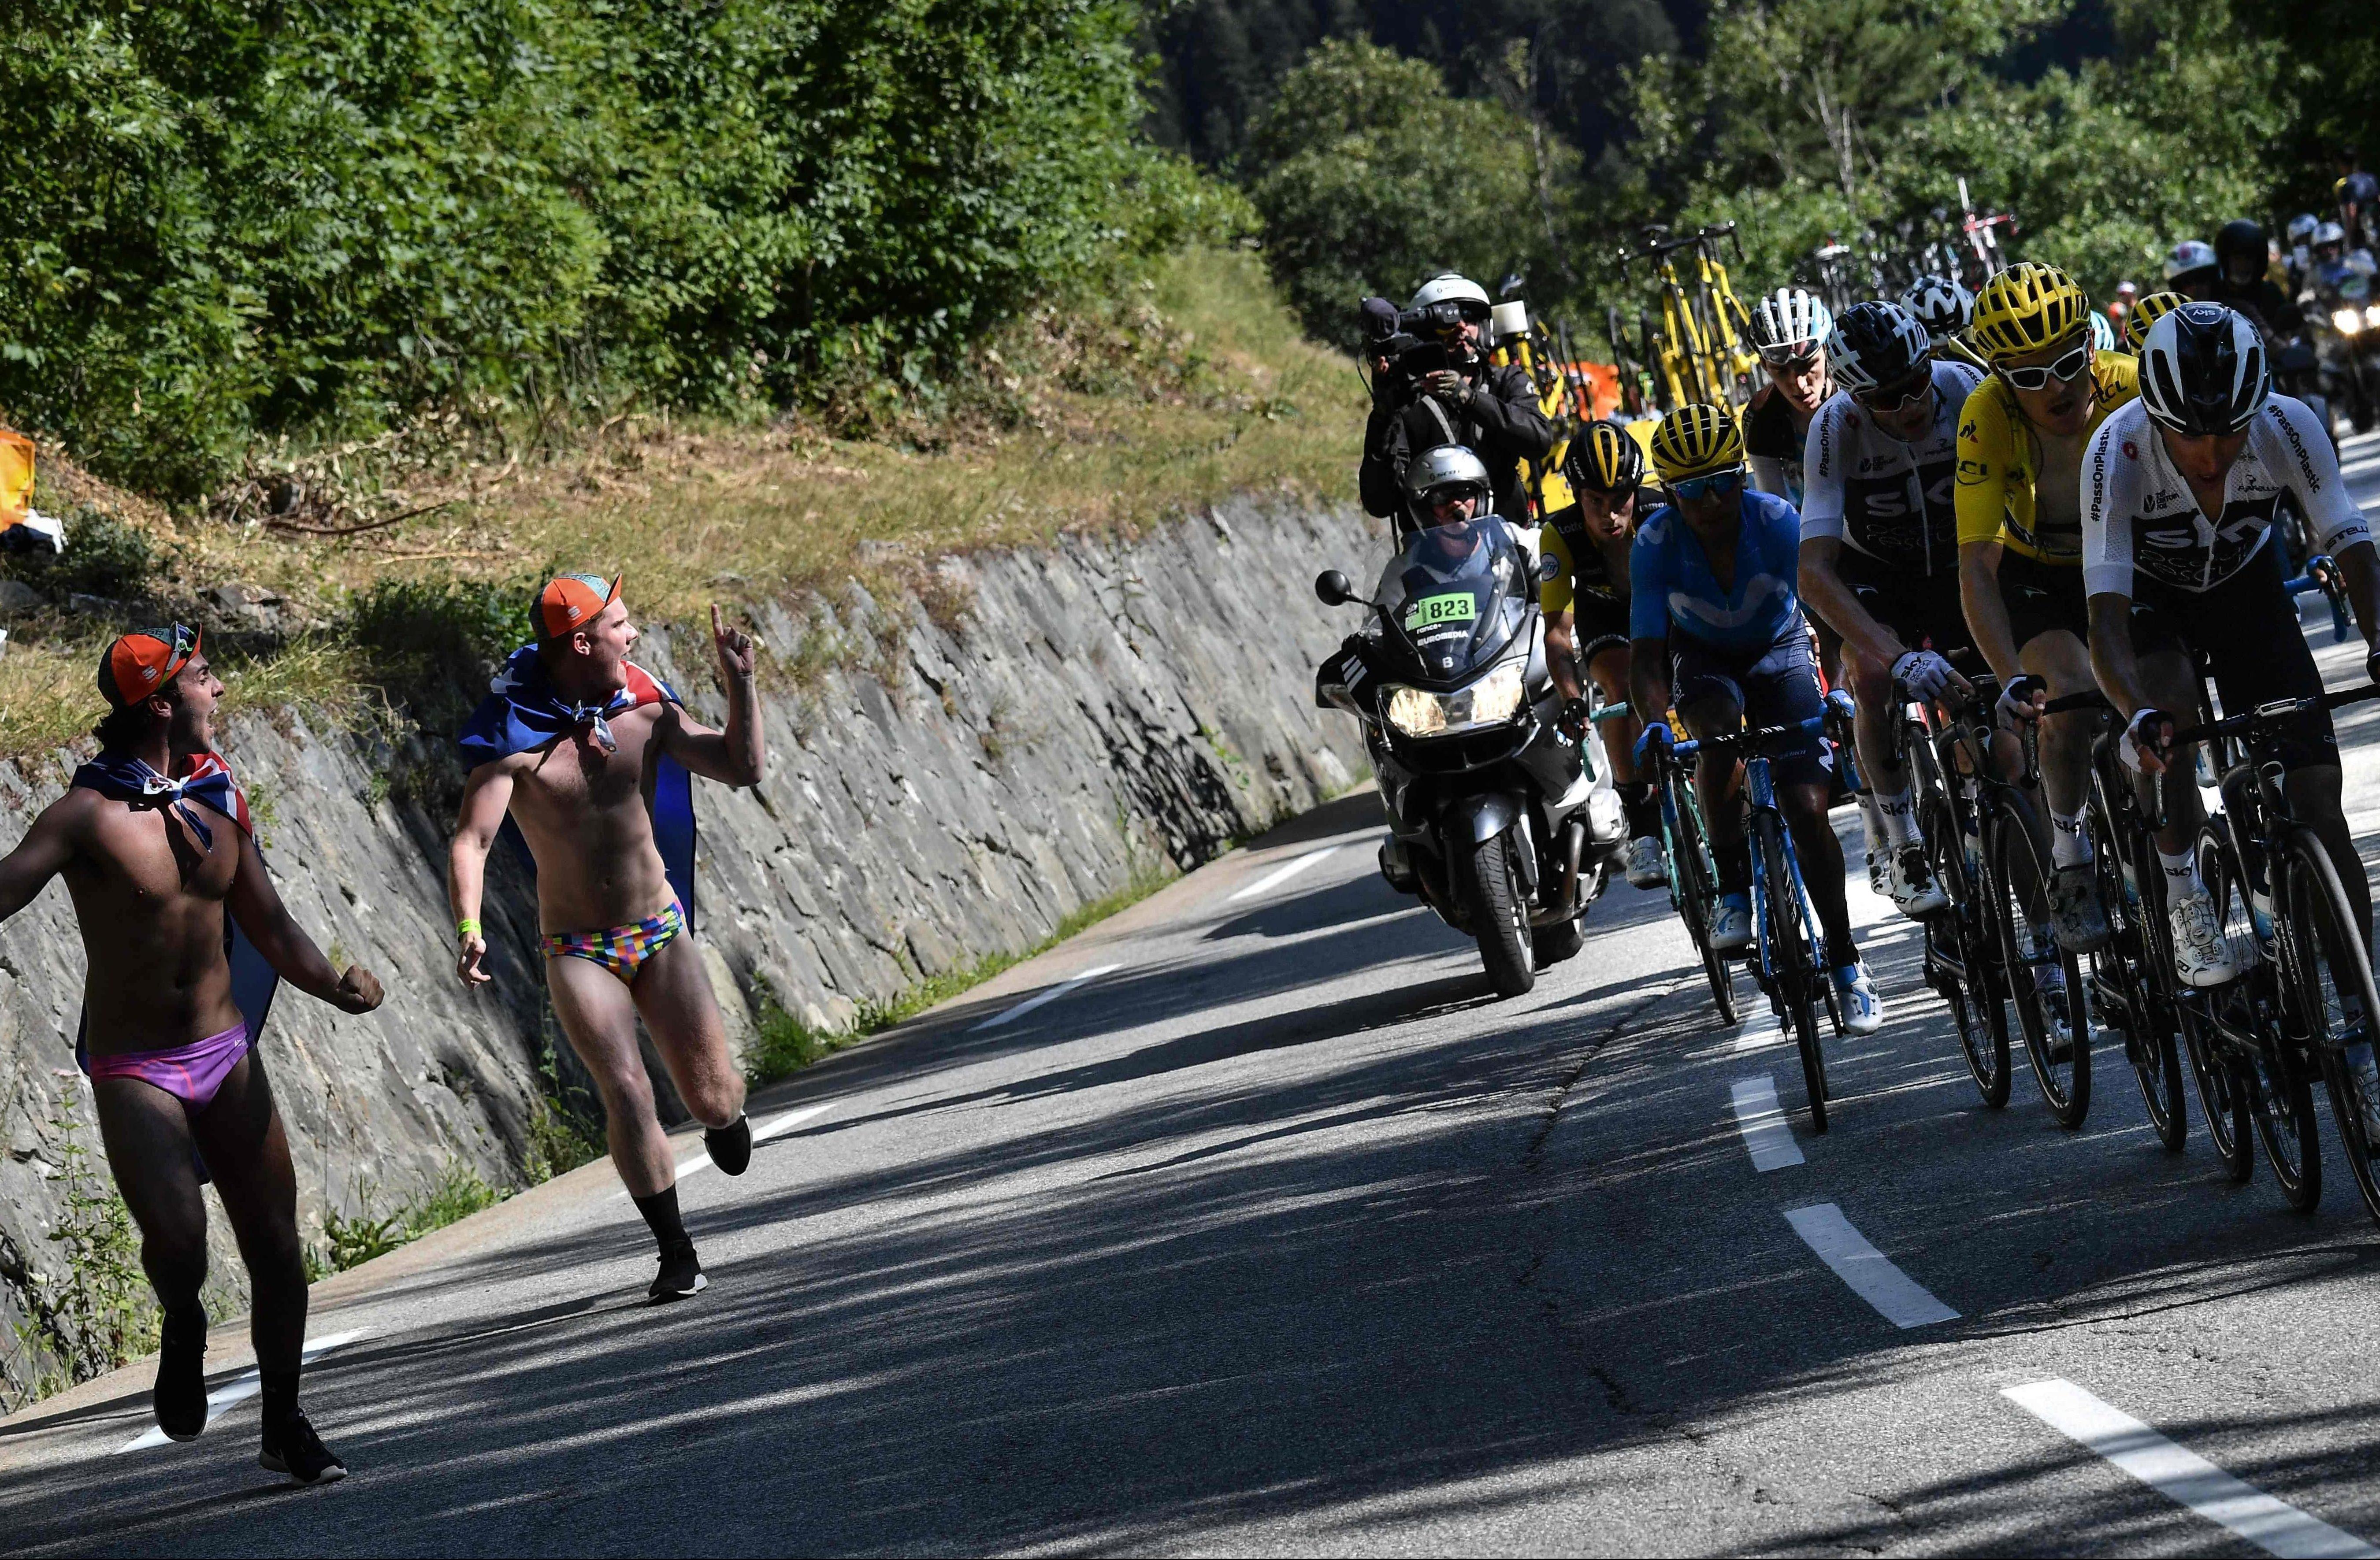 Fans run alongside, from right, Colombia's Egan Bernal, Geraint Thomas, Chris Froome, France's Romain Bardet (rear) and Colombia's Nairo Quintana